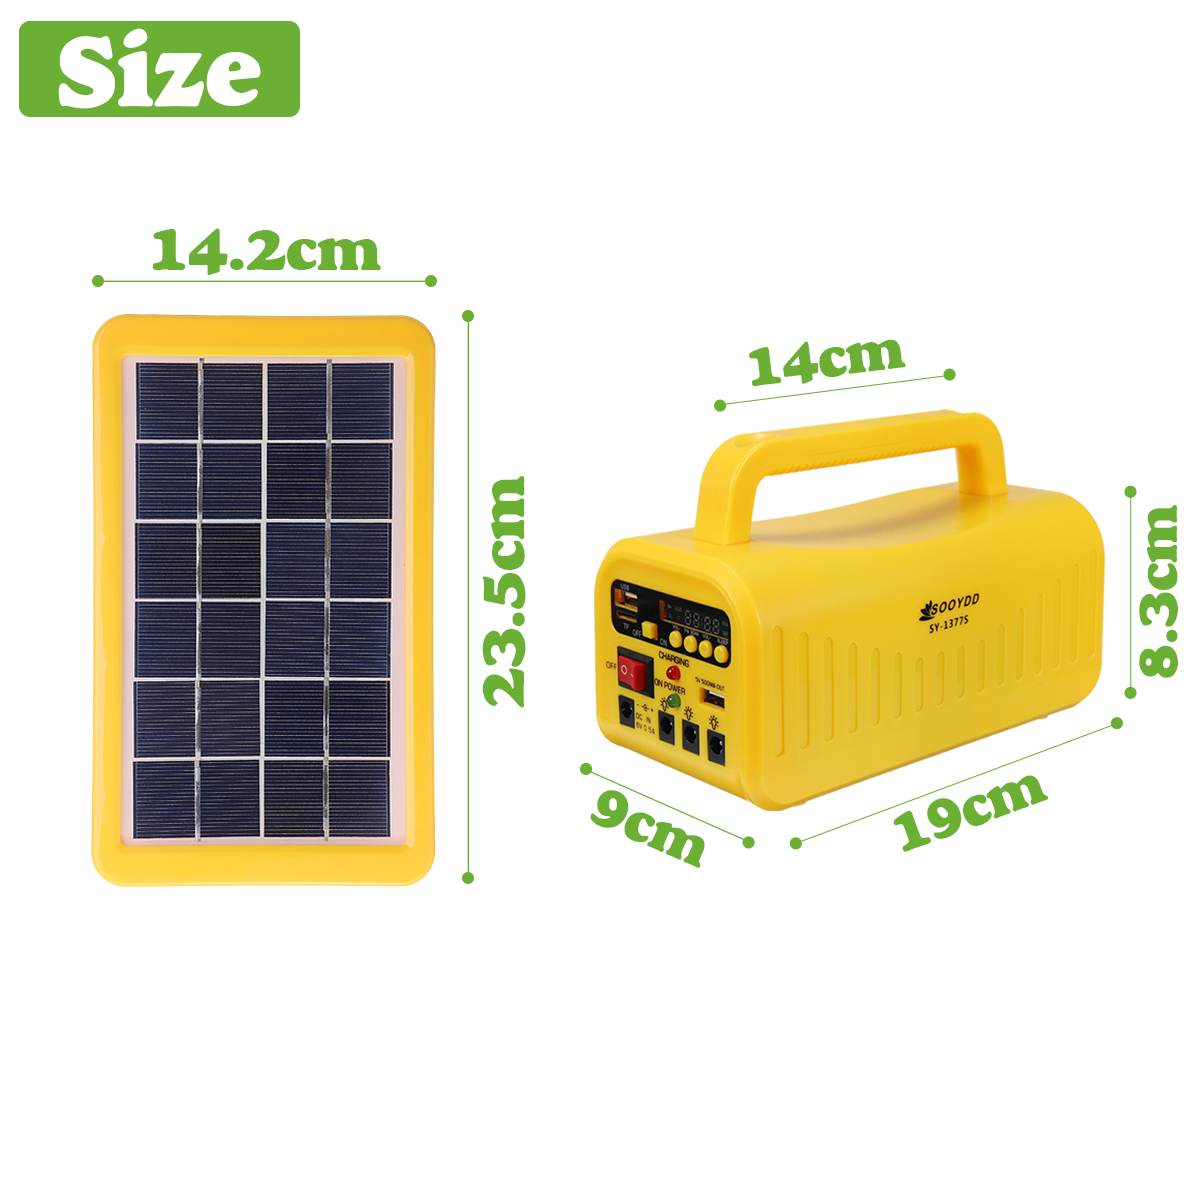 Solar Battery System >> Portable Solar Panel System 3w 6v Solar Battery Charger 4500mah